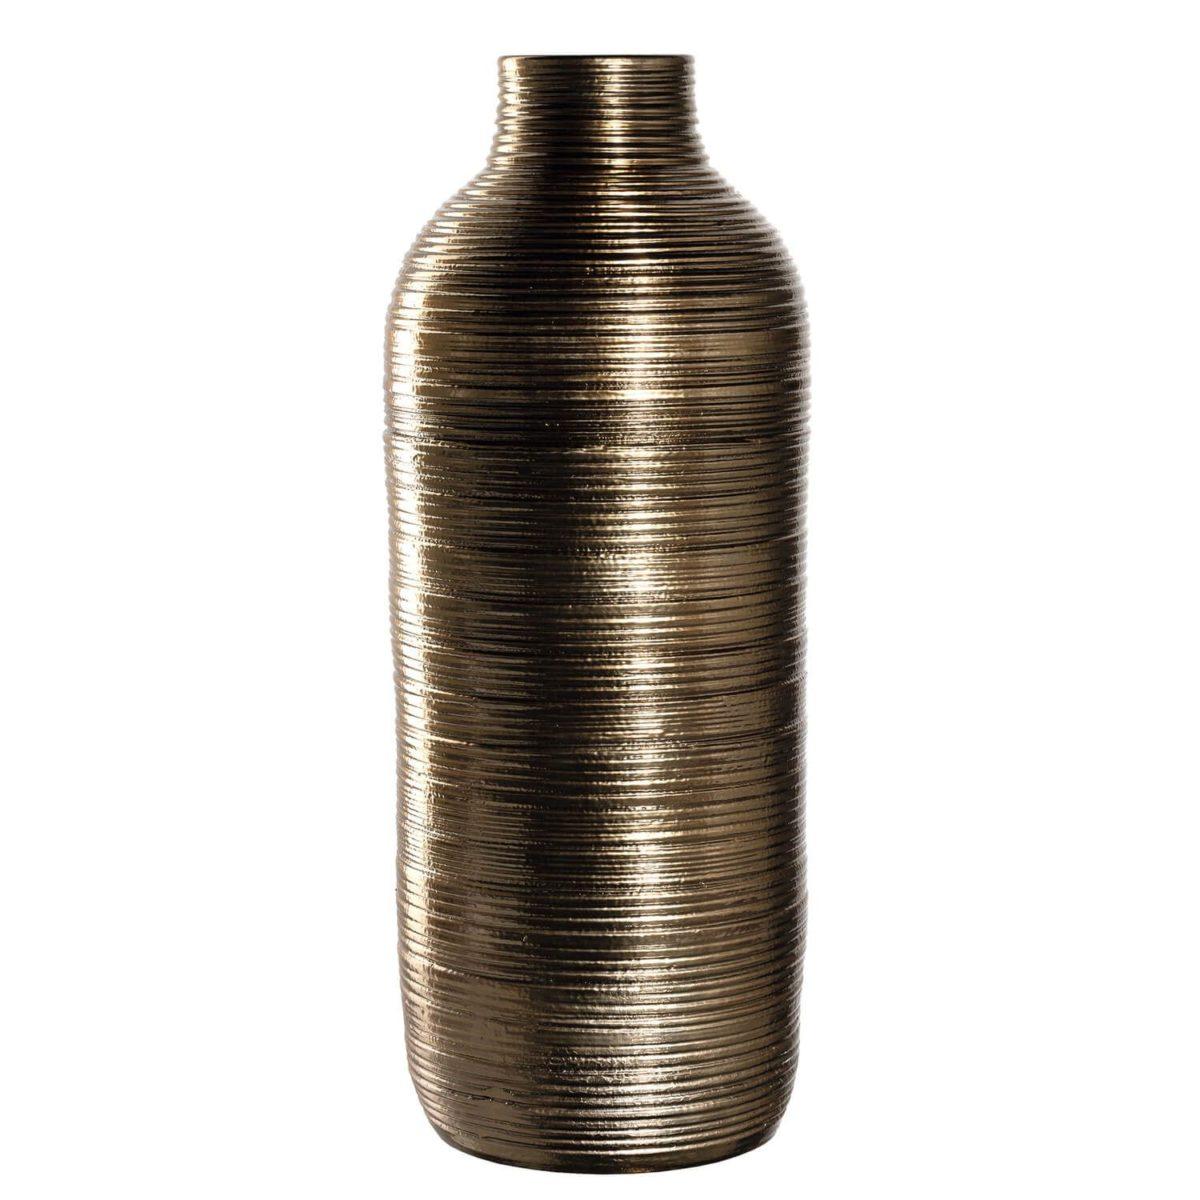 041341 0 k 1200x1200 - Vaza Decora LEONARDO (L041341)